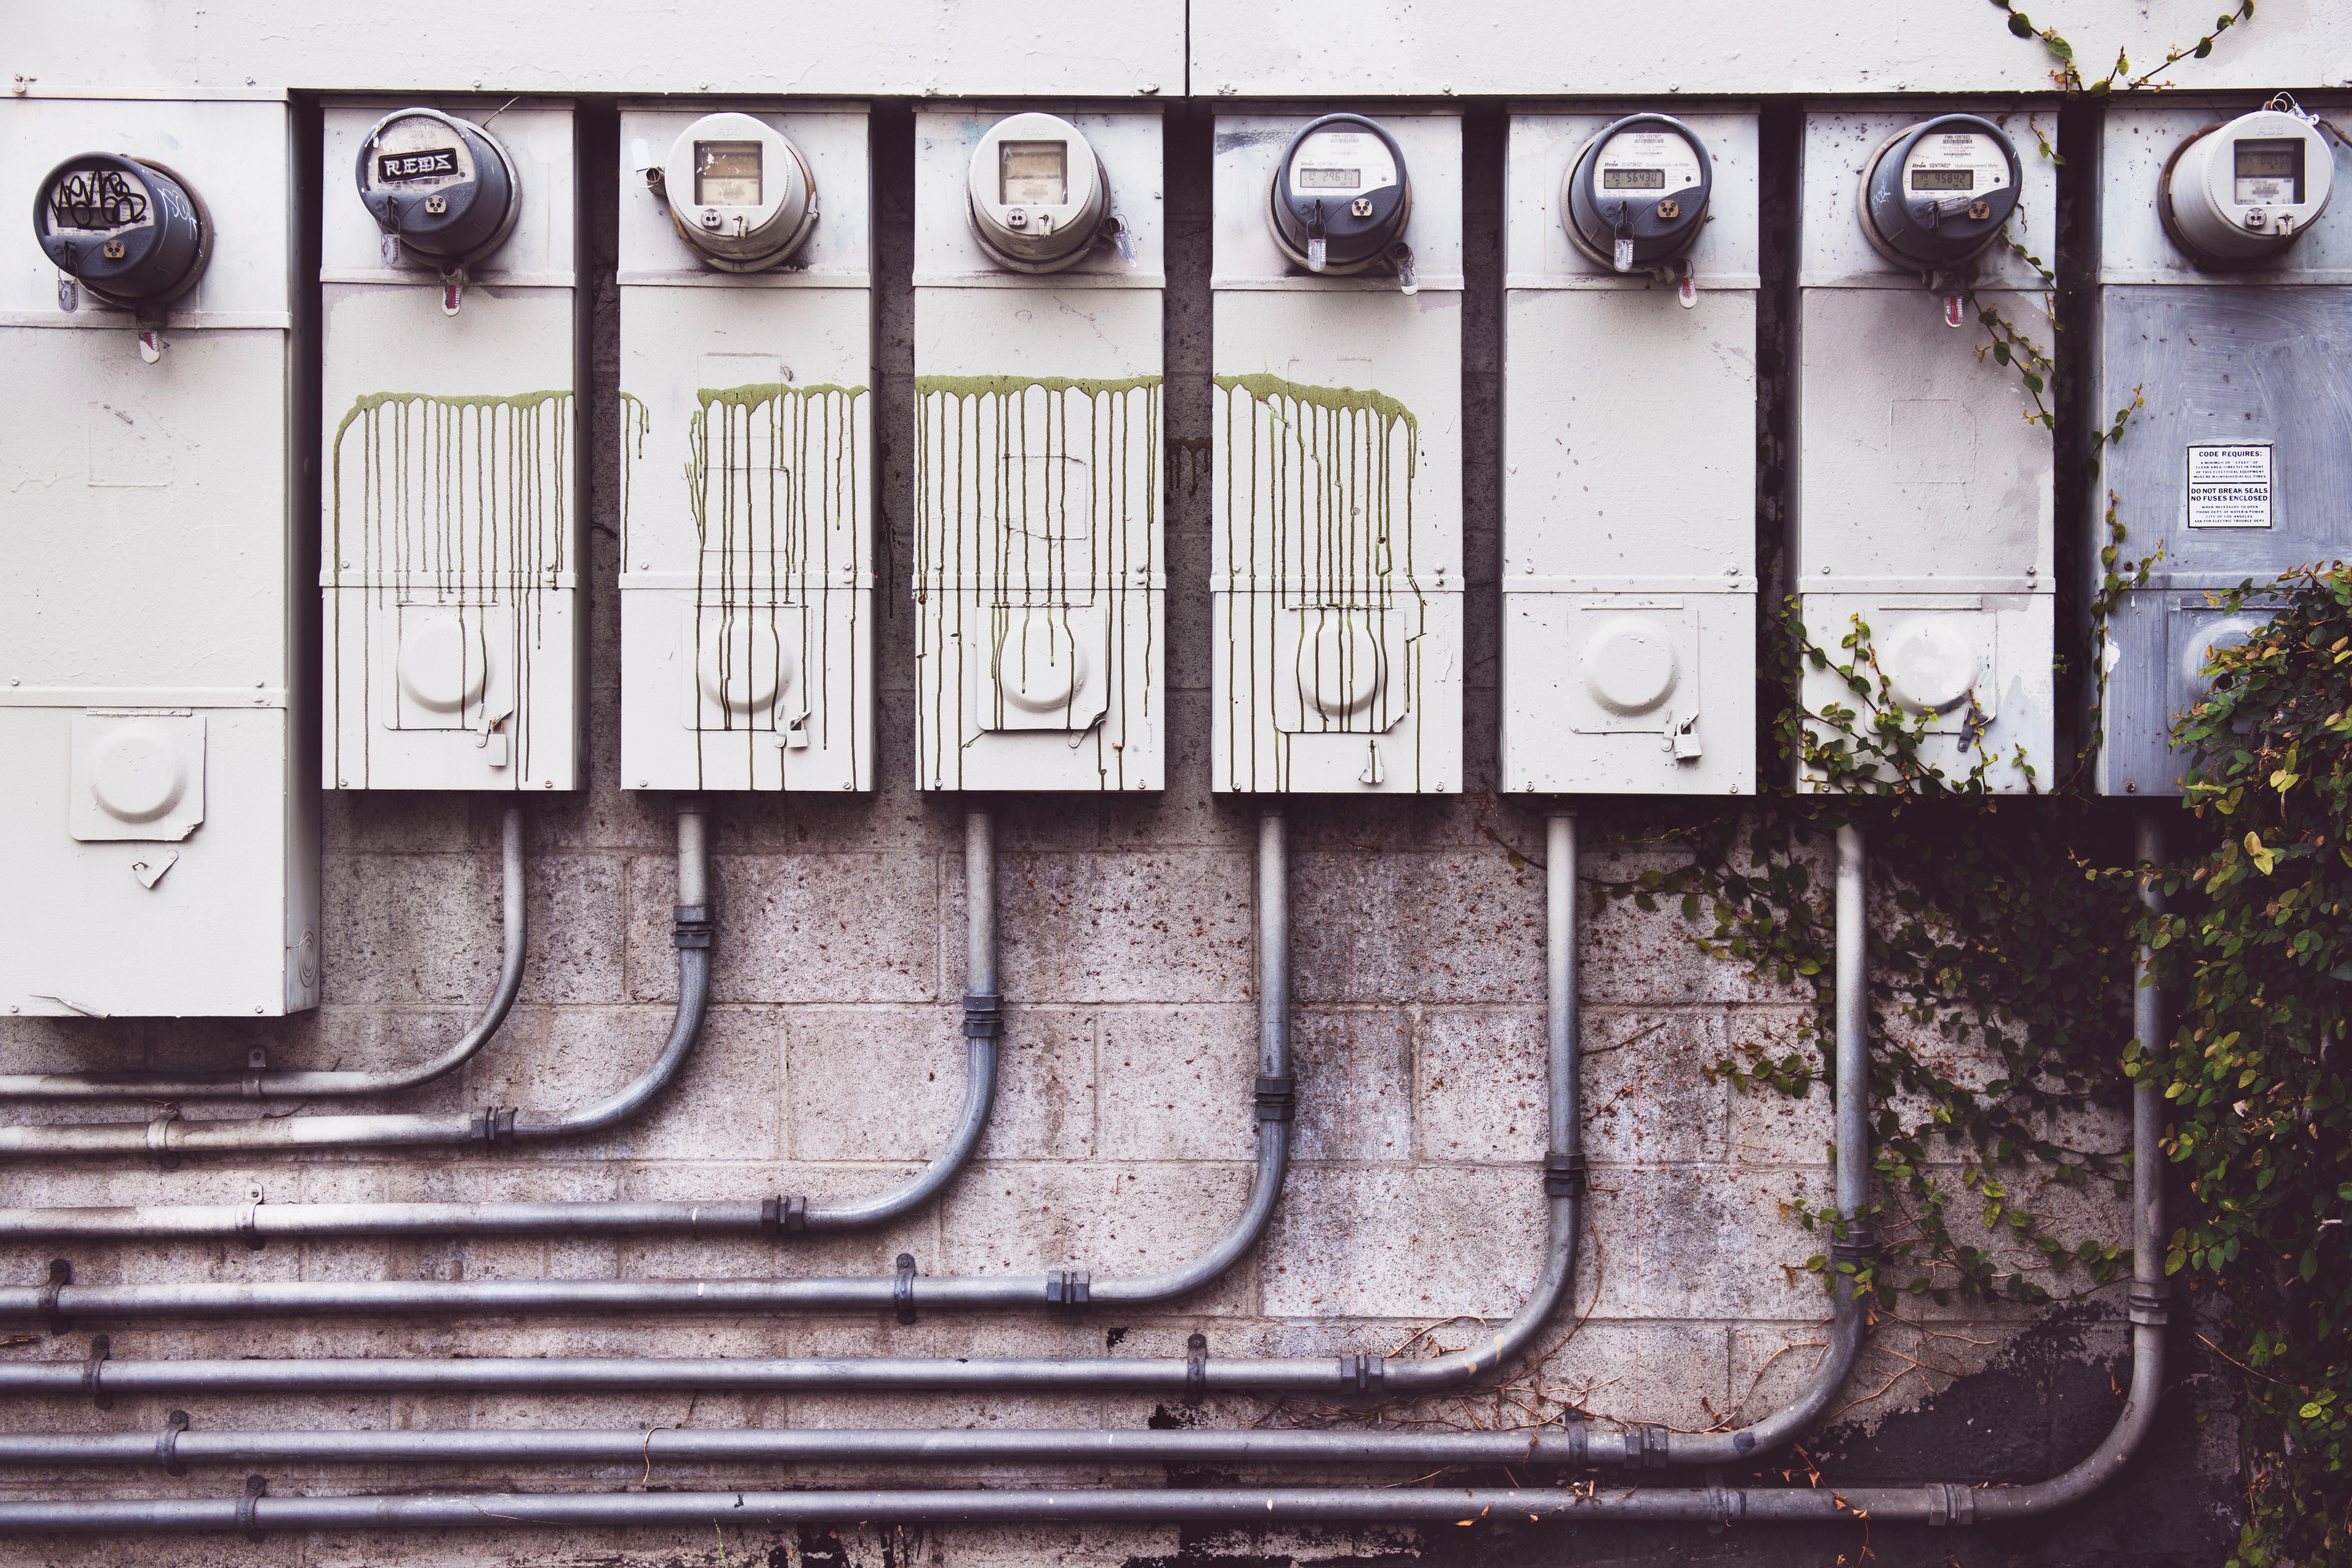 Portion Control – Maximizing Through Discipline